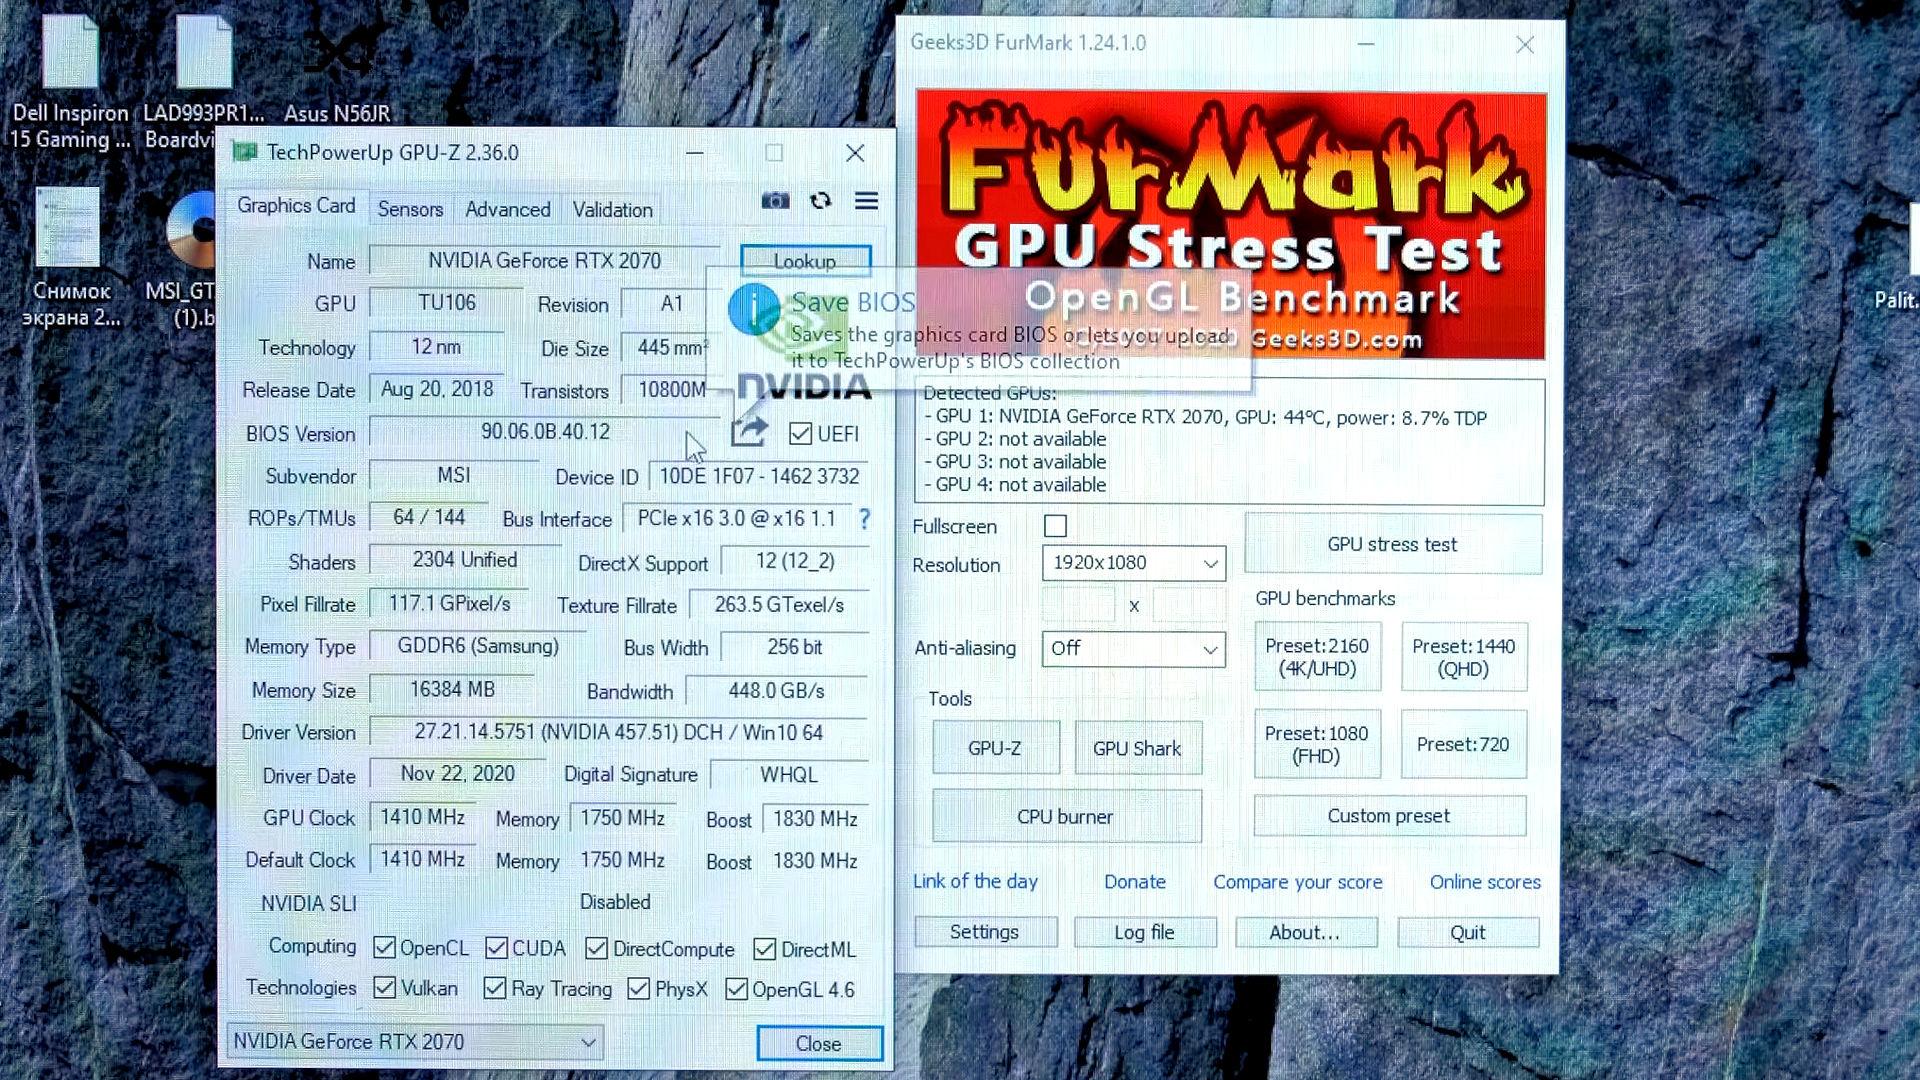 Энтузиаст оснастил 16-гигабайтным видеобуфером карту GeForce RTX 2070